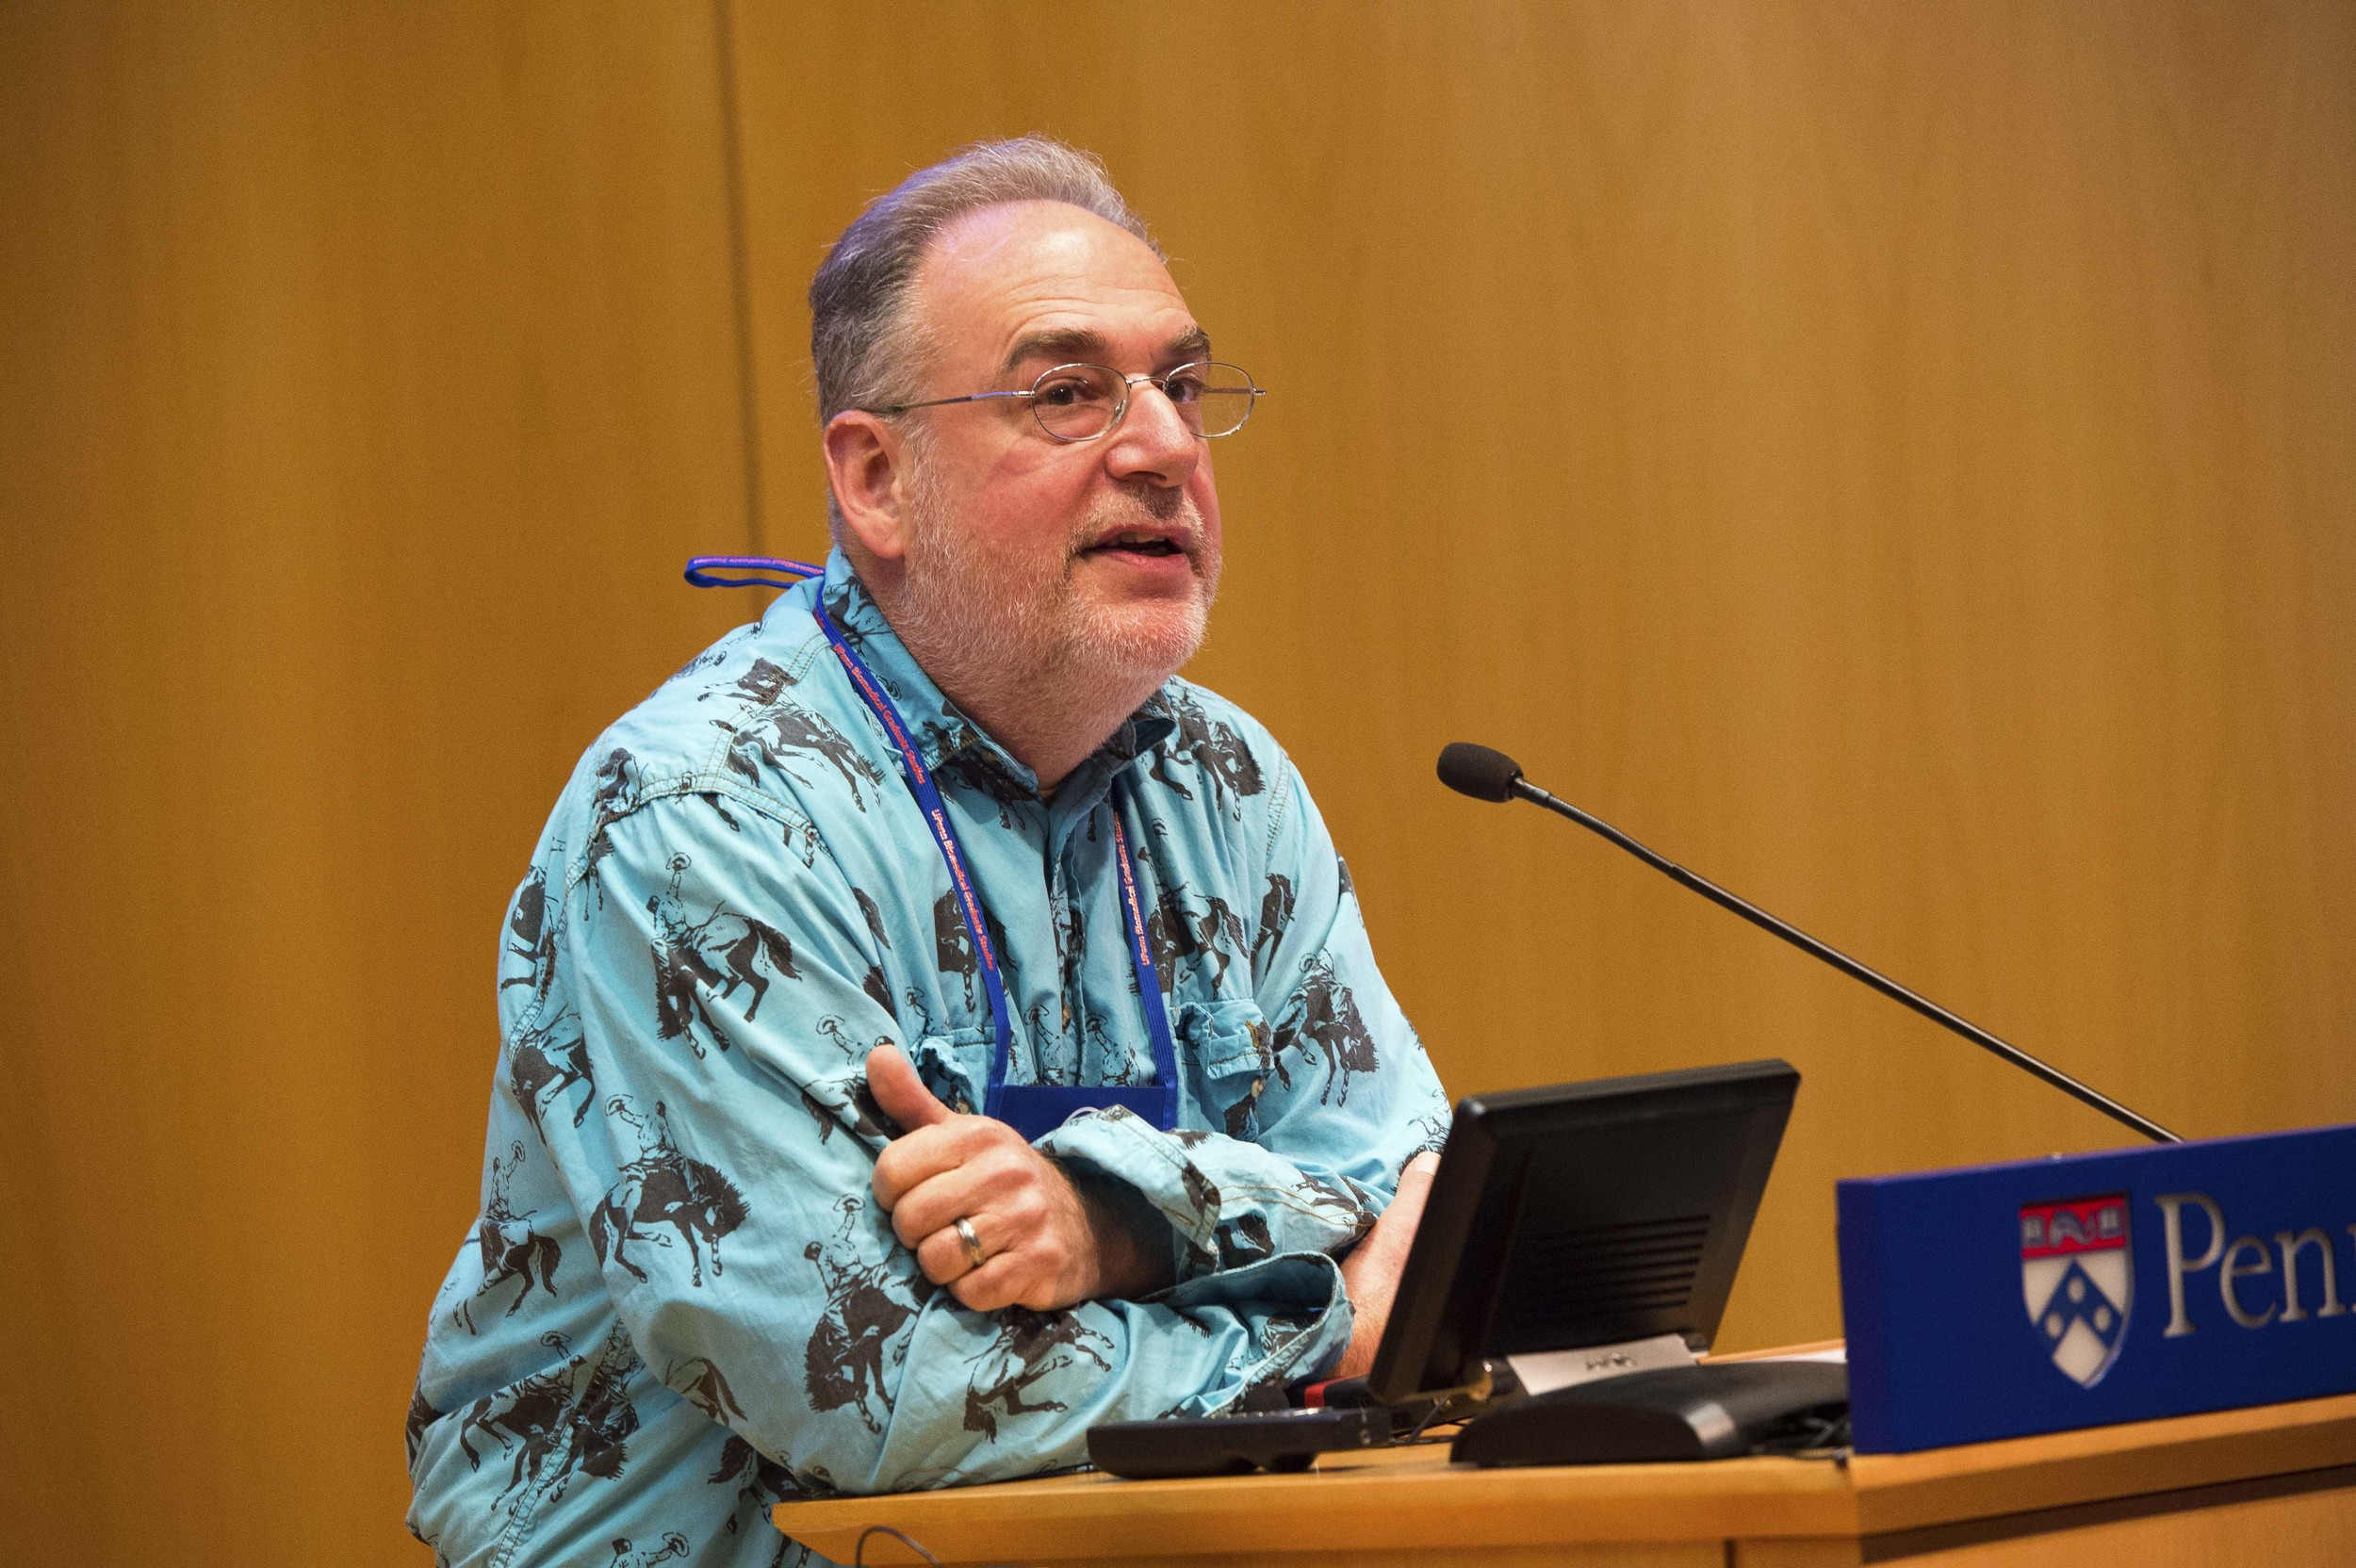 Michael P. Nusbaum, PhD